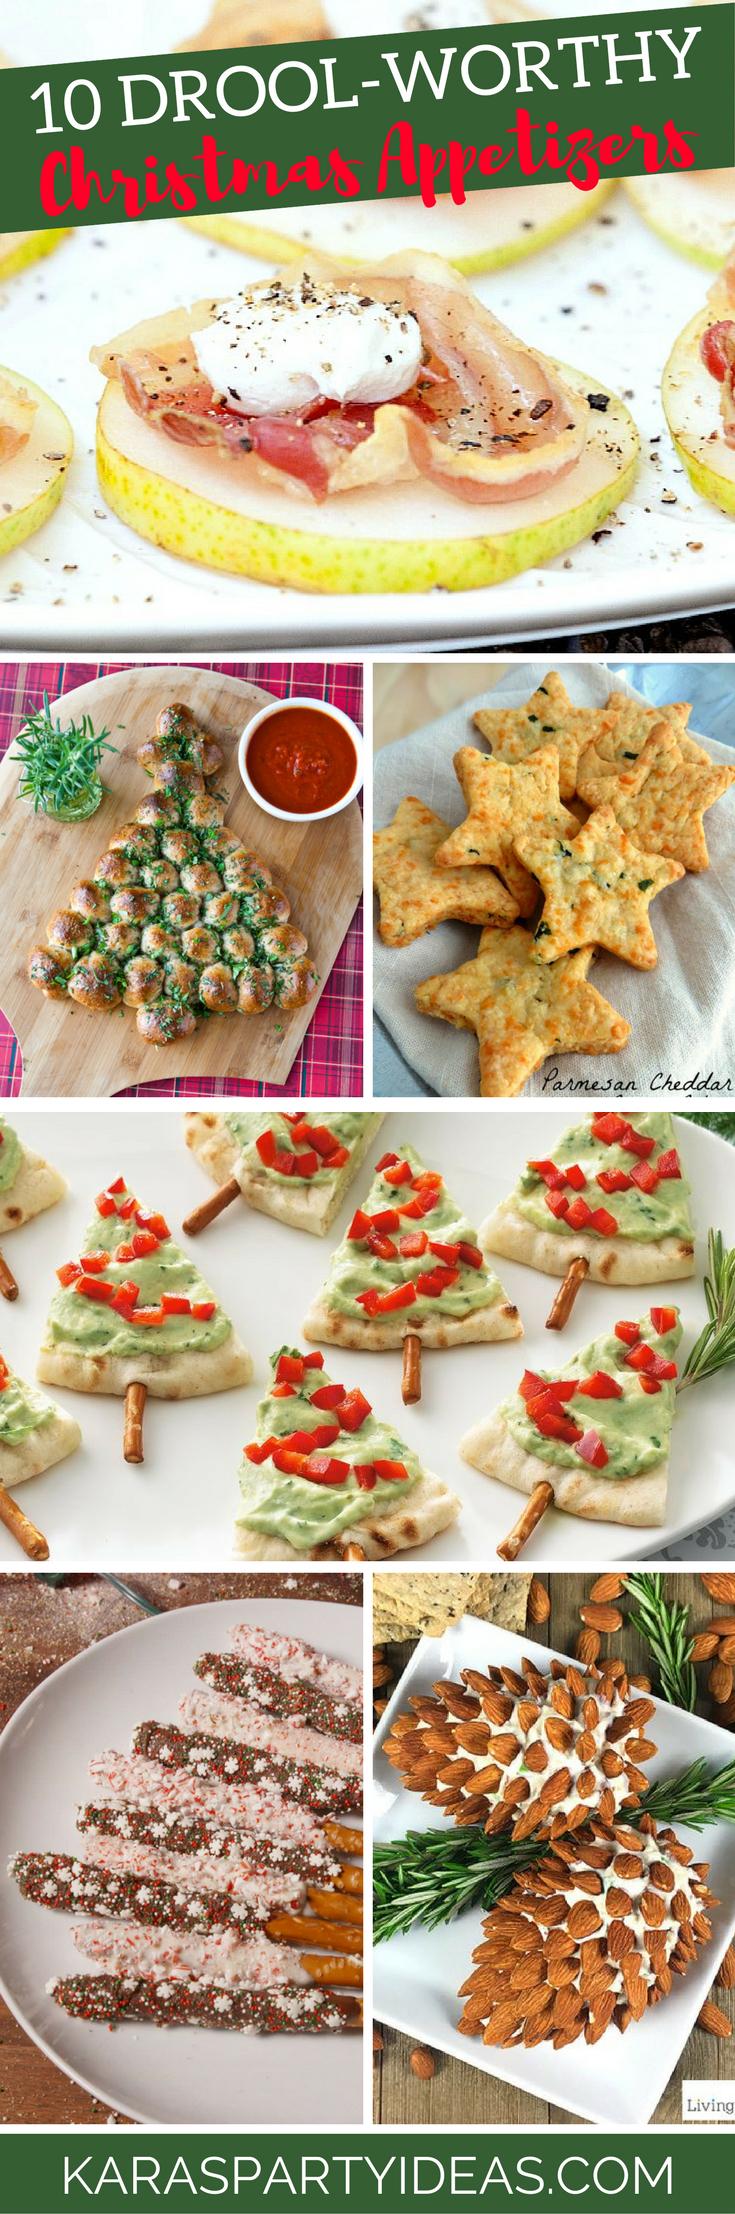 10 Drool Worthy Christmas Appetizers via Kara's Party Ideas - KarasPartyIdeas.com